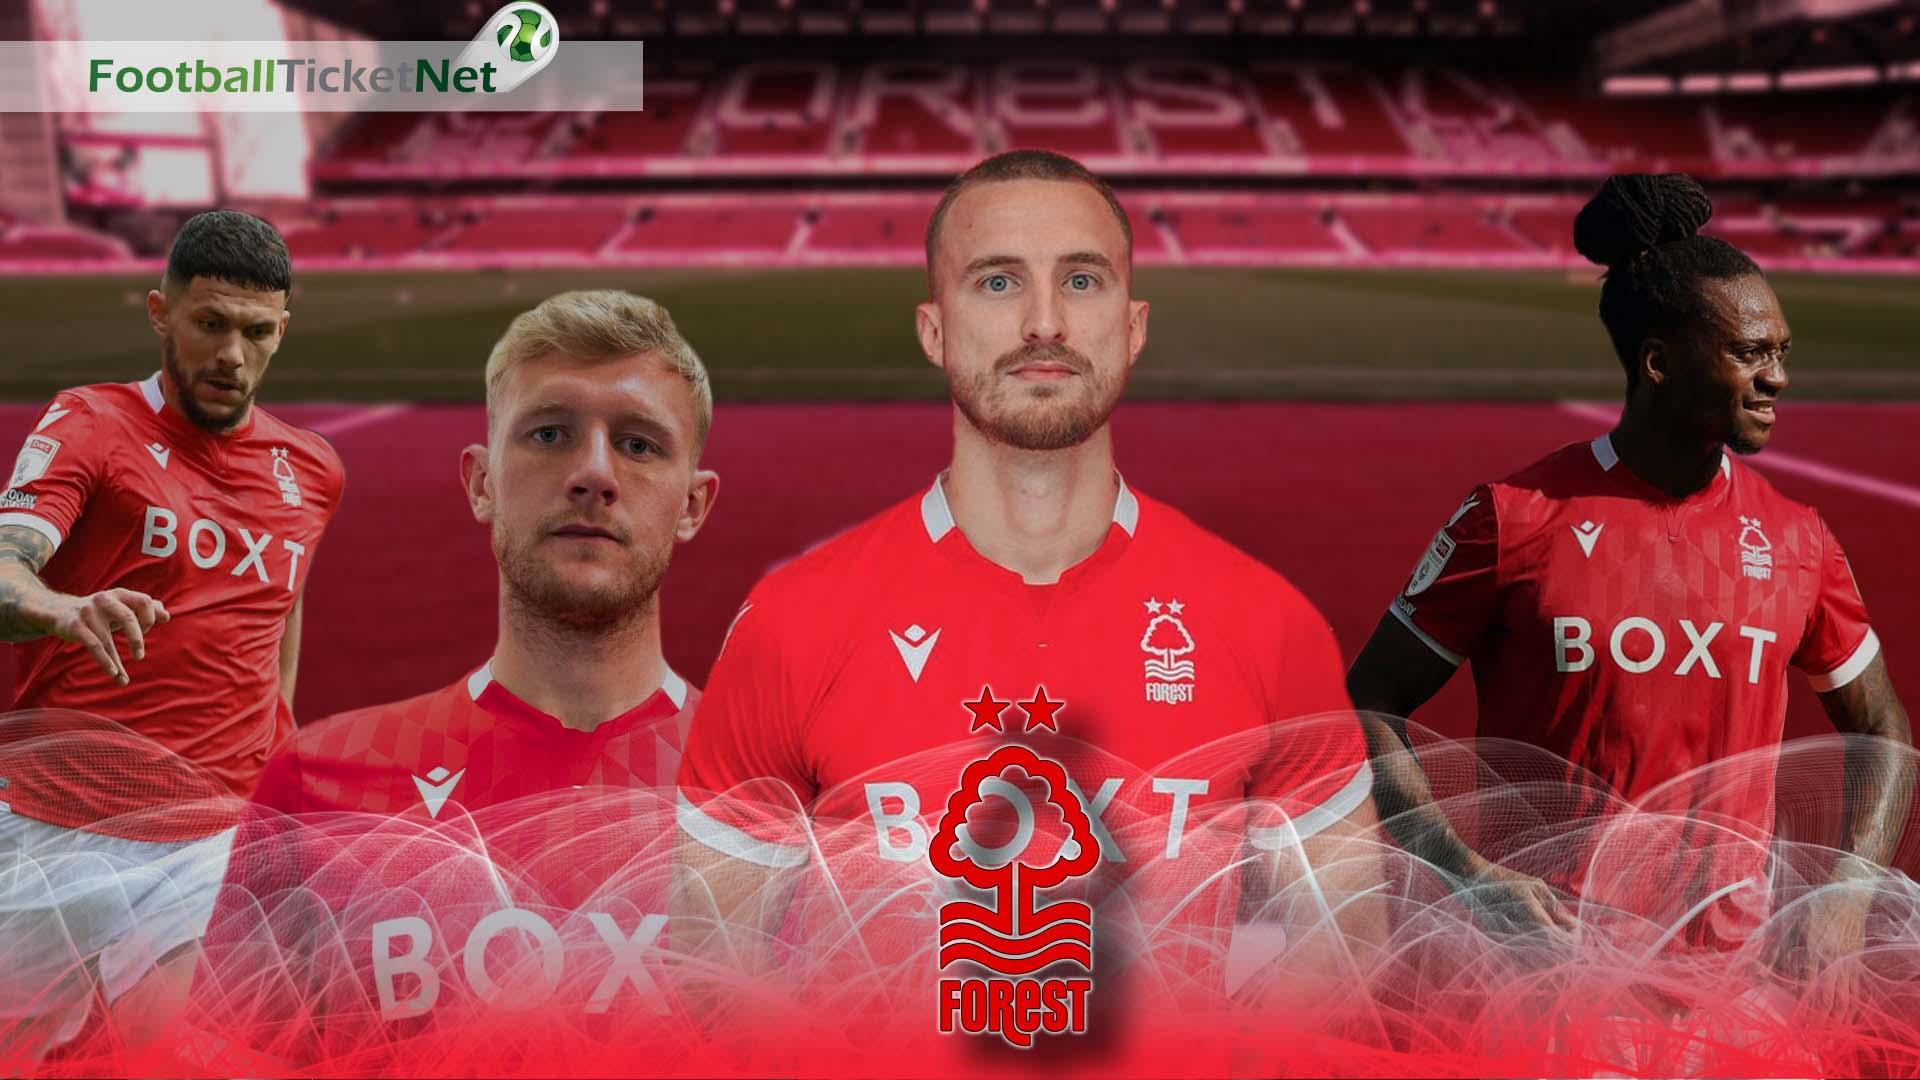 Nottingham rencontres en ligne CS aller crier Matchmaking